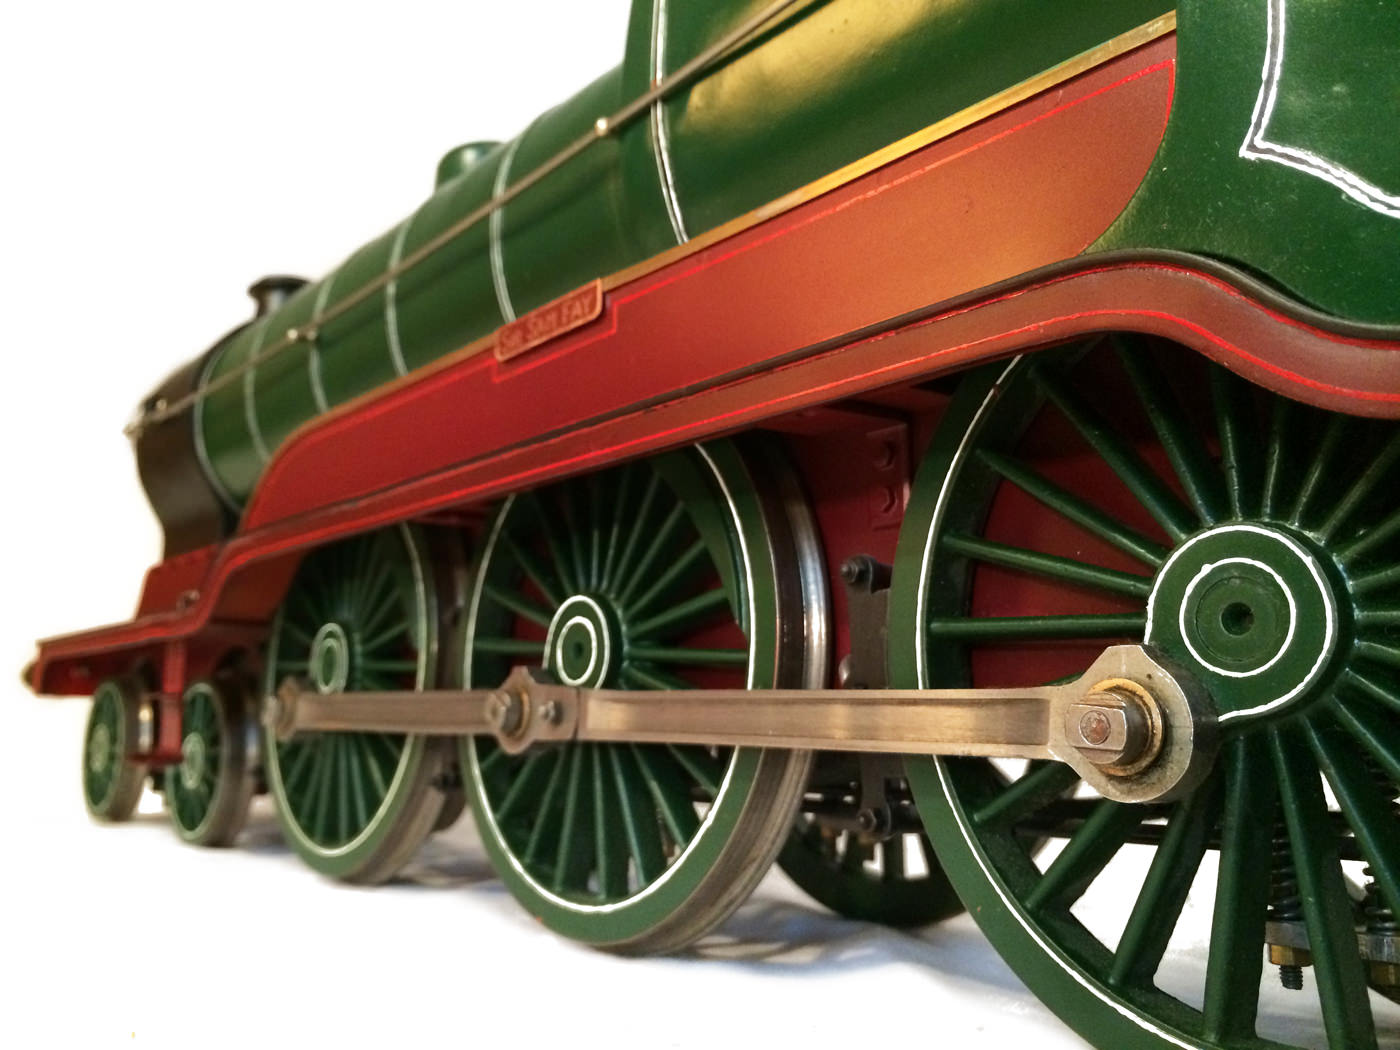 test 3 and a half inch gauge GCR Sir Sam Fay I Class live steam locomotive for sale 07